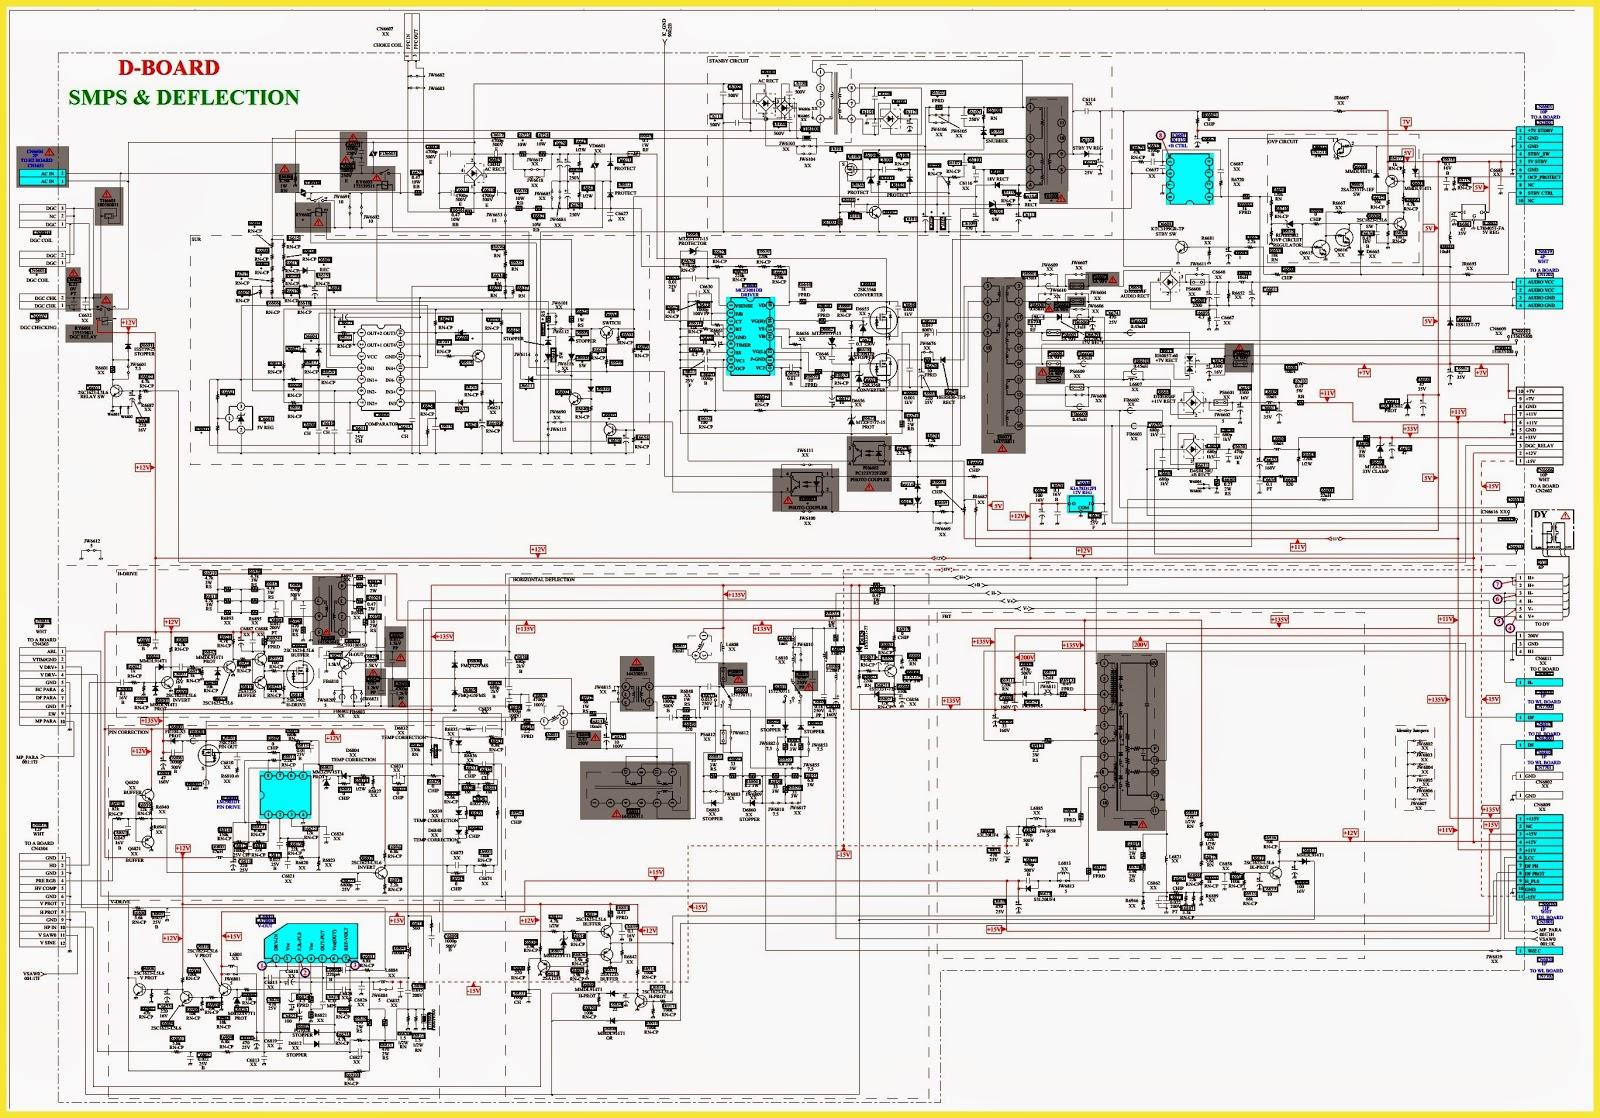 Lg Tv Wiring Diagram Periodic Diagrams Science 19 Inch Lcd Monitor Power Supply Schematic Circuit Sony Wega Trinitron Kv Da322m66 Da322m64 Reset Smps And